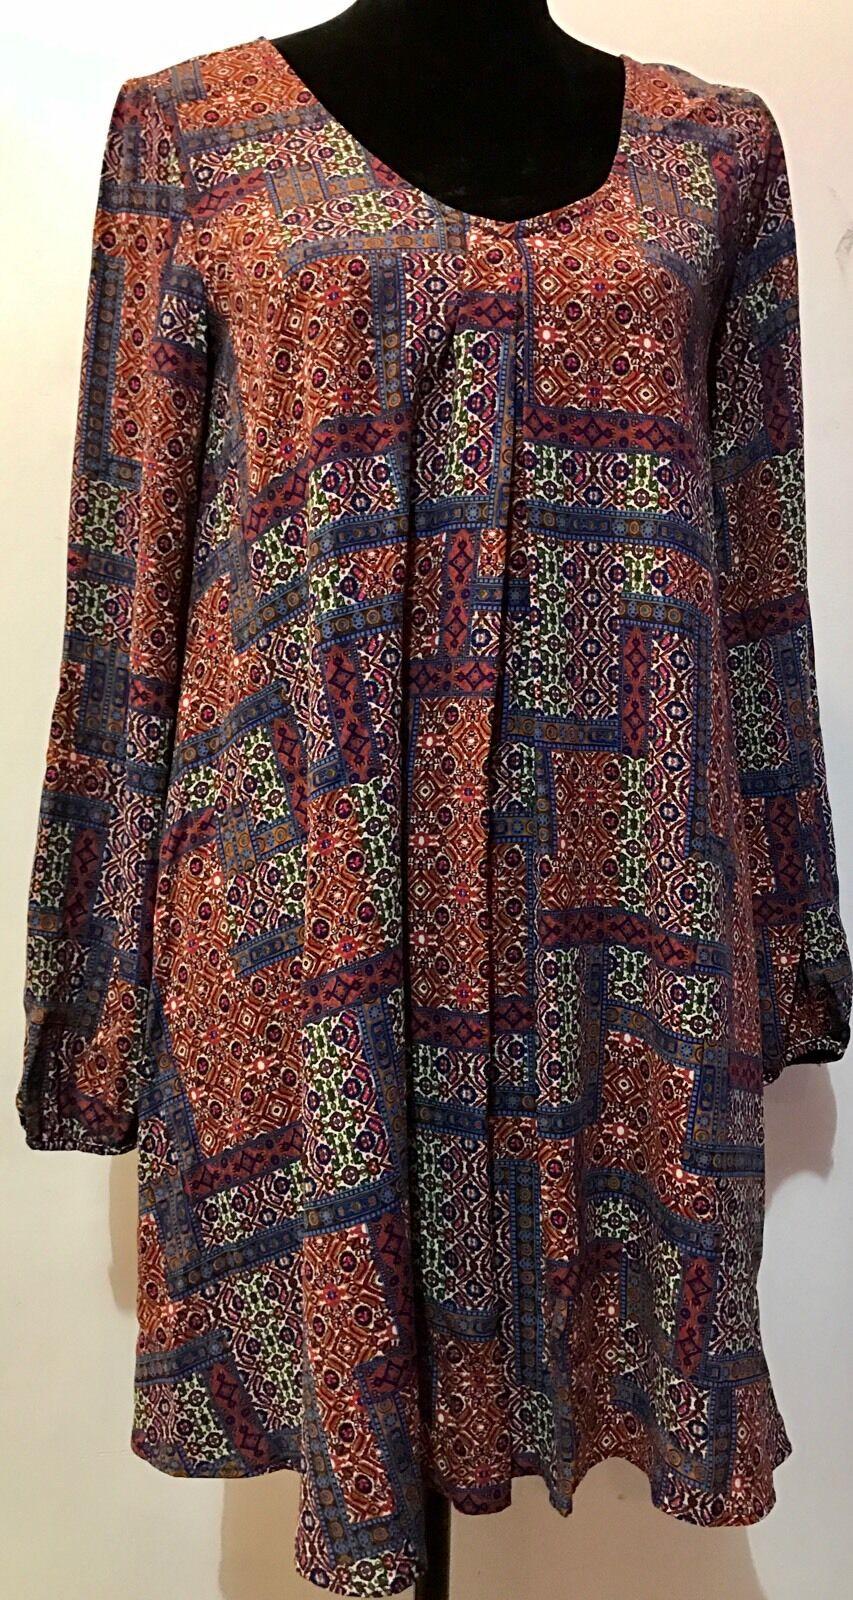 Soprano Bohemian Style Light Summer Sexy Dress Soprano  Size M